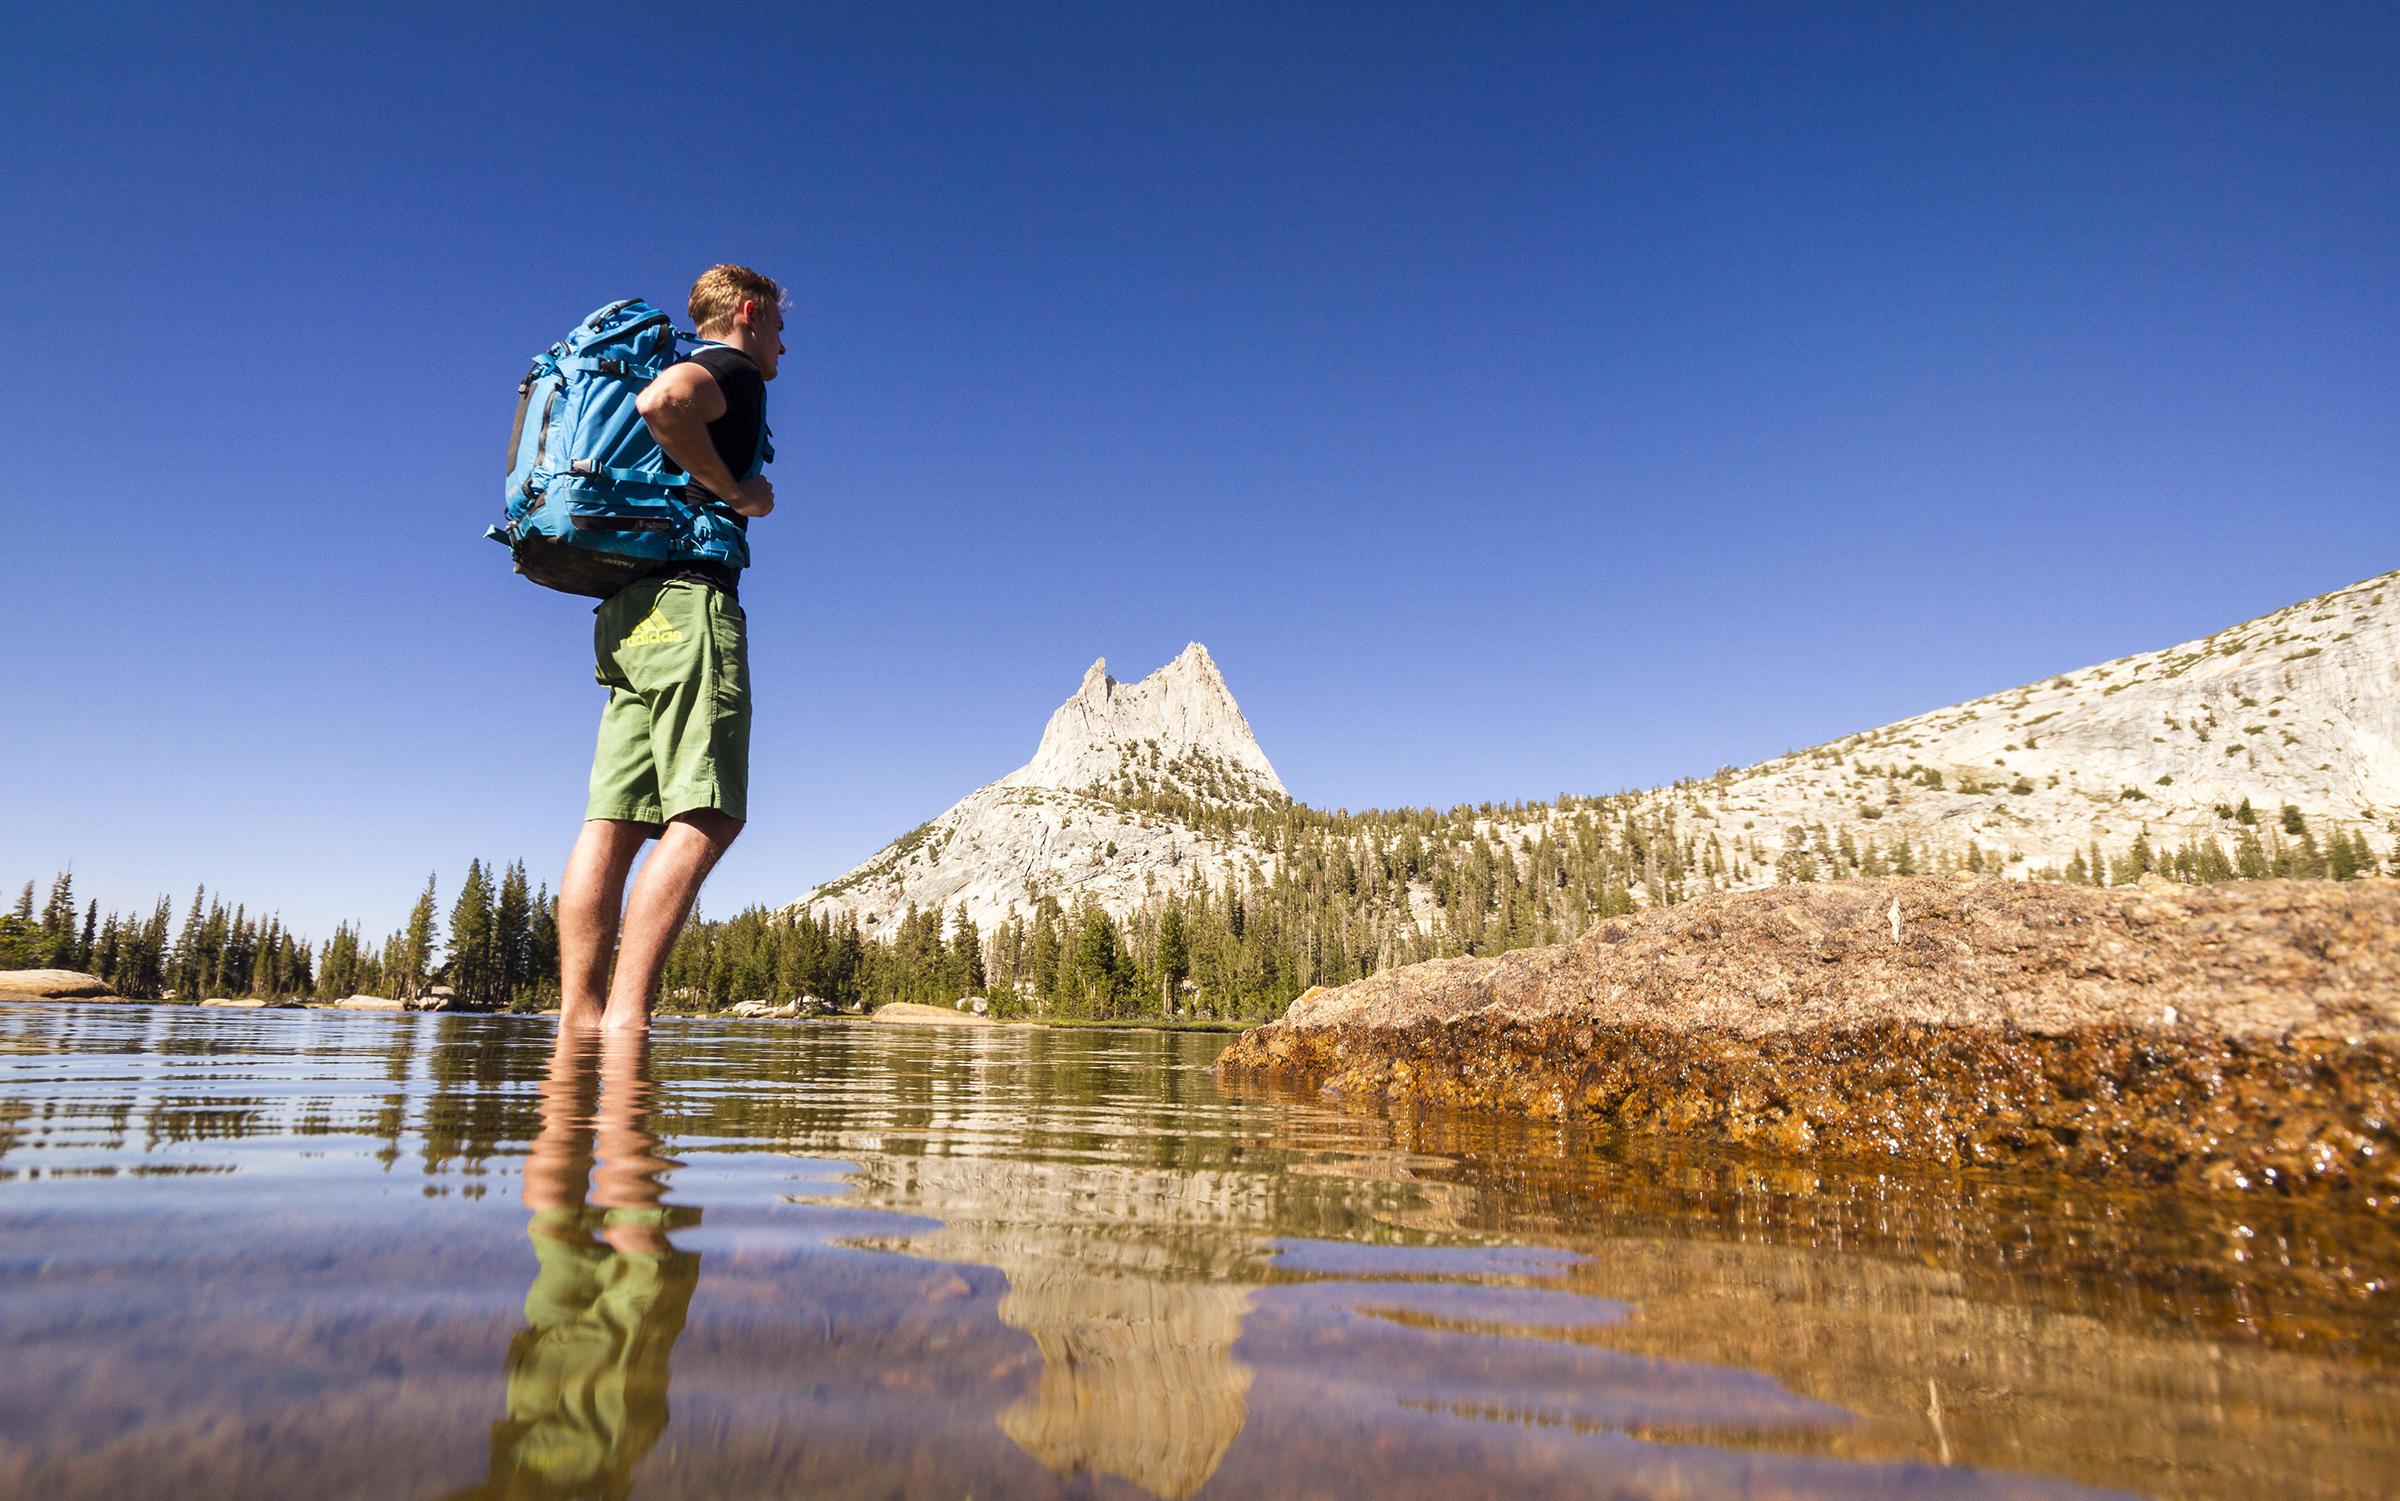 Yosemite National Park, California. Axel Brunst/Tandemstock.com